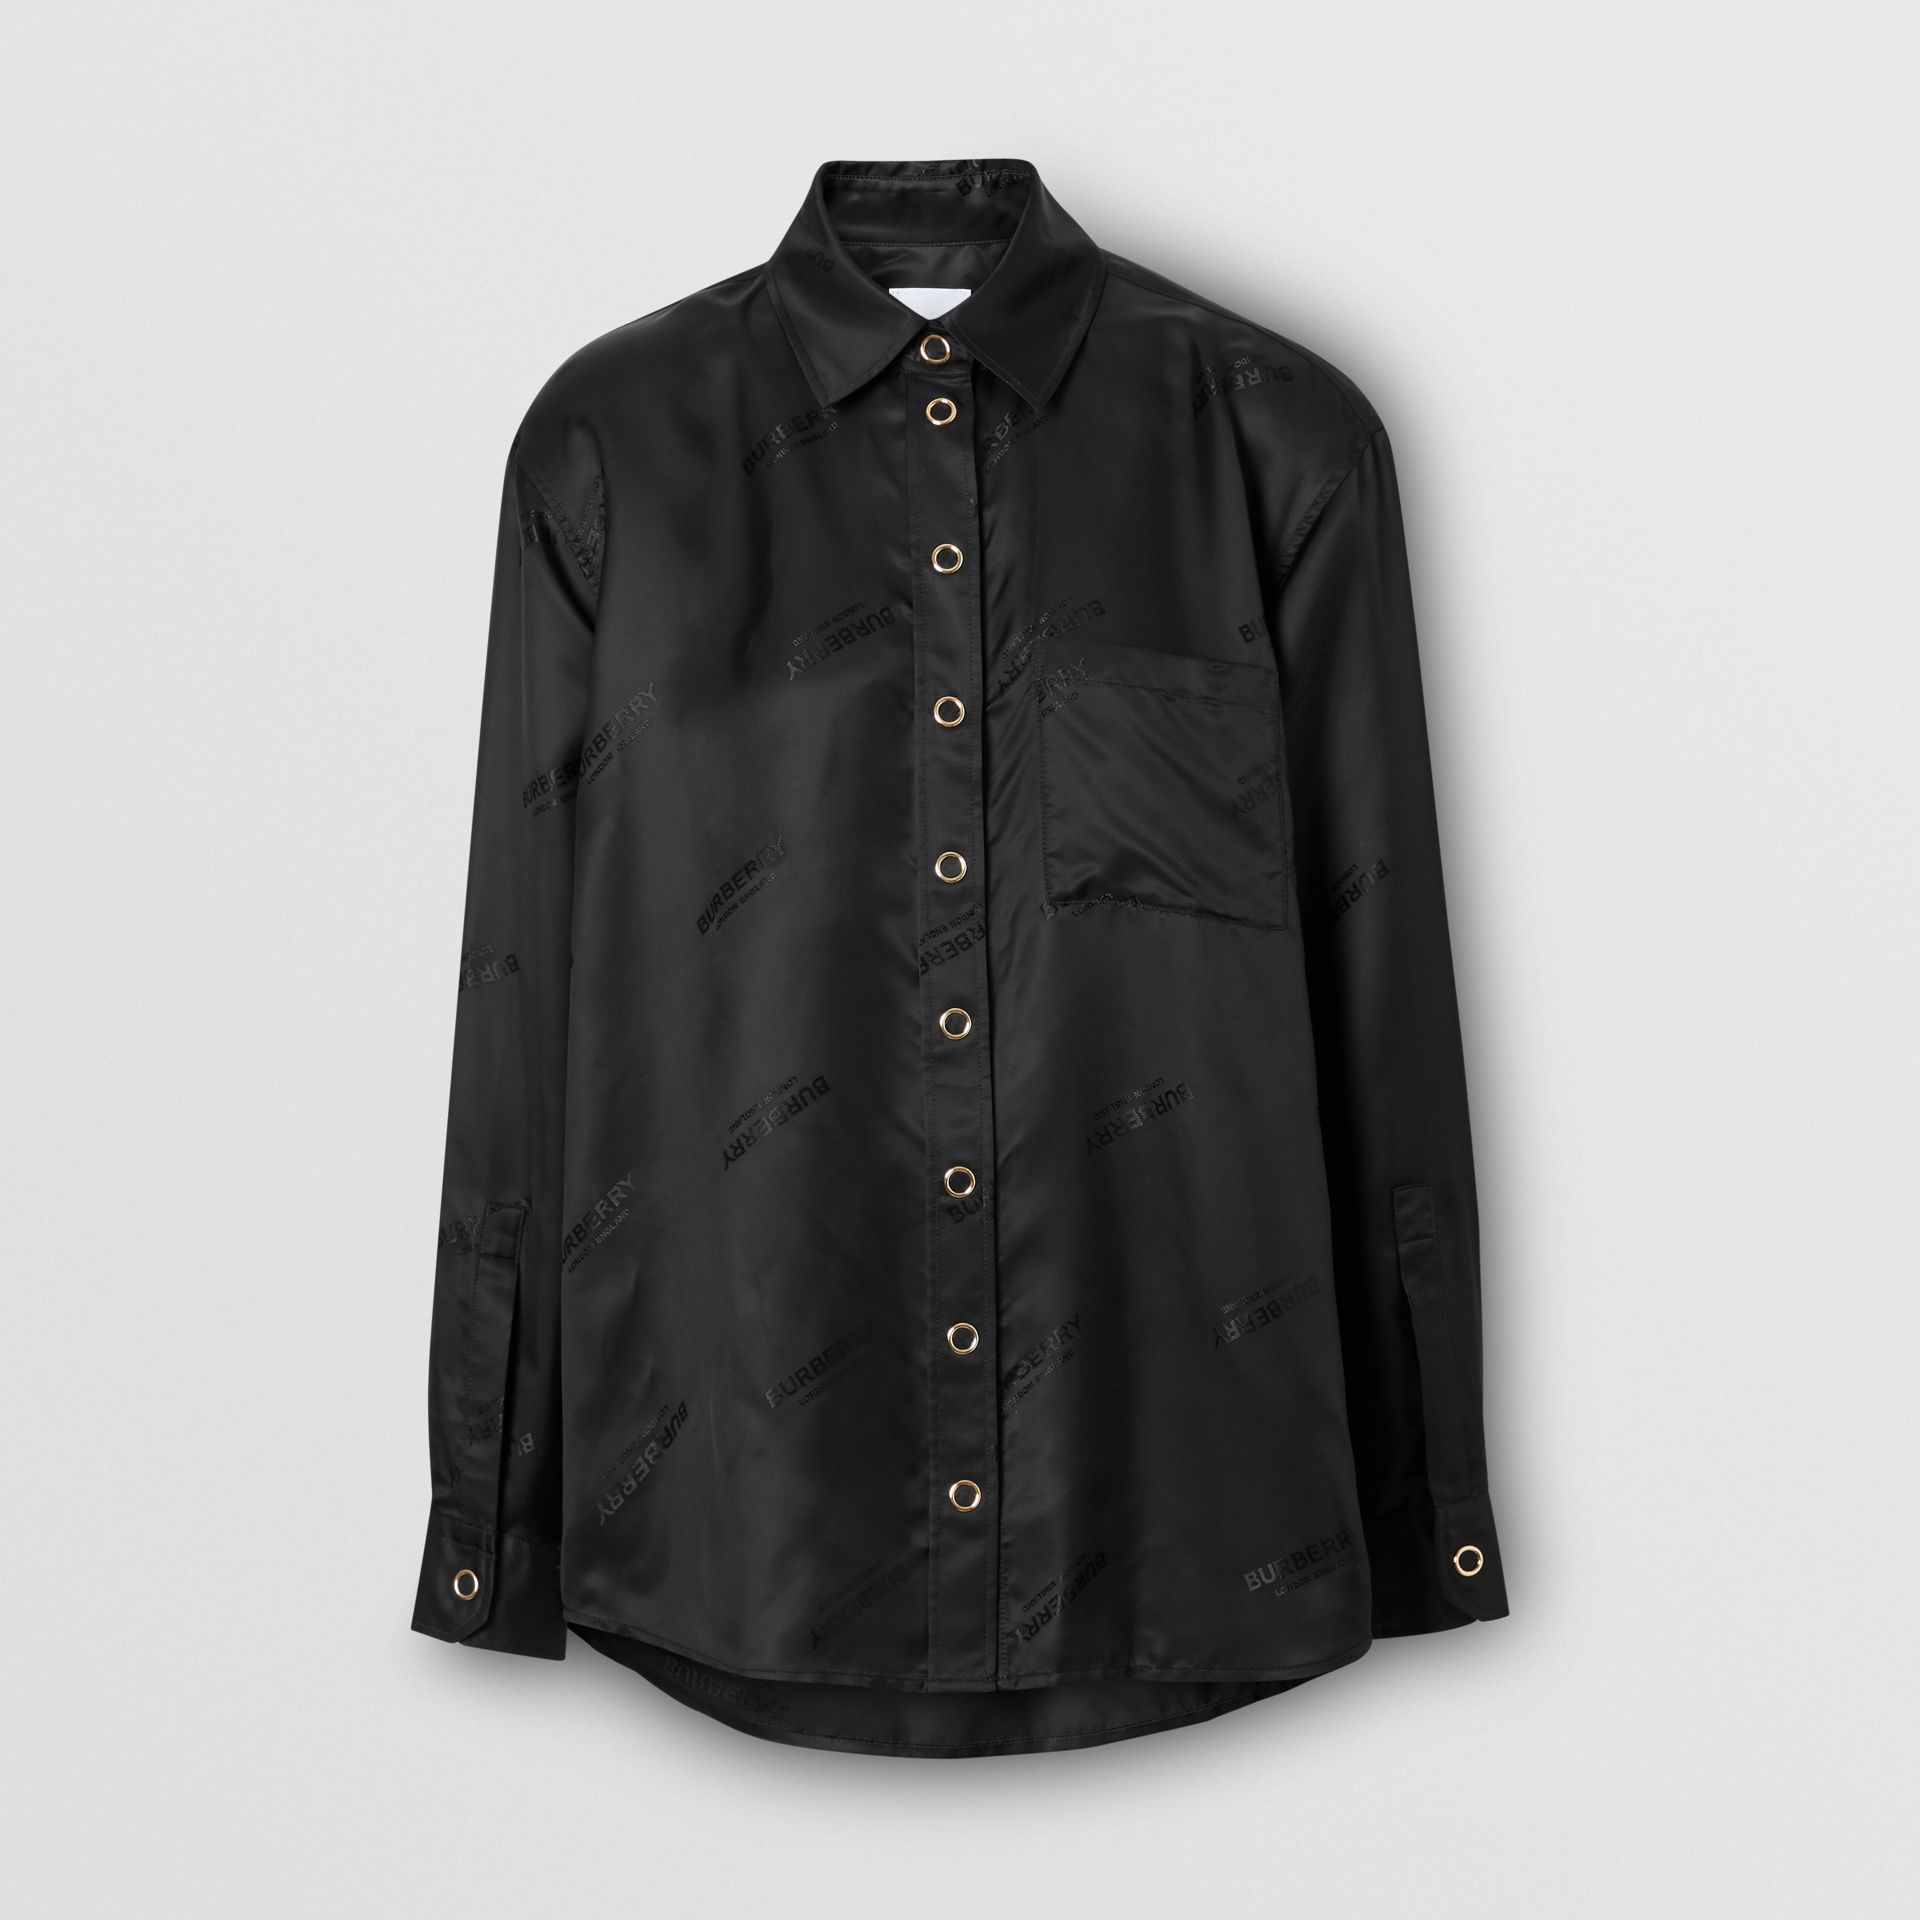 Logo Jacquard Shirt in Black - Women | Burberry - gallery image 3